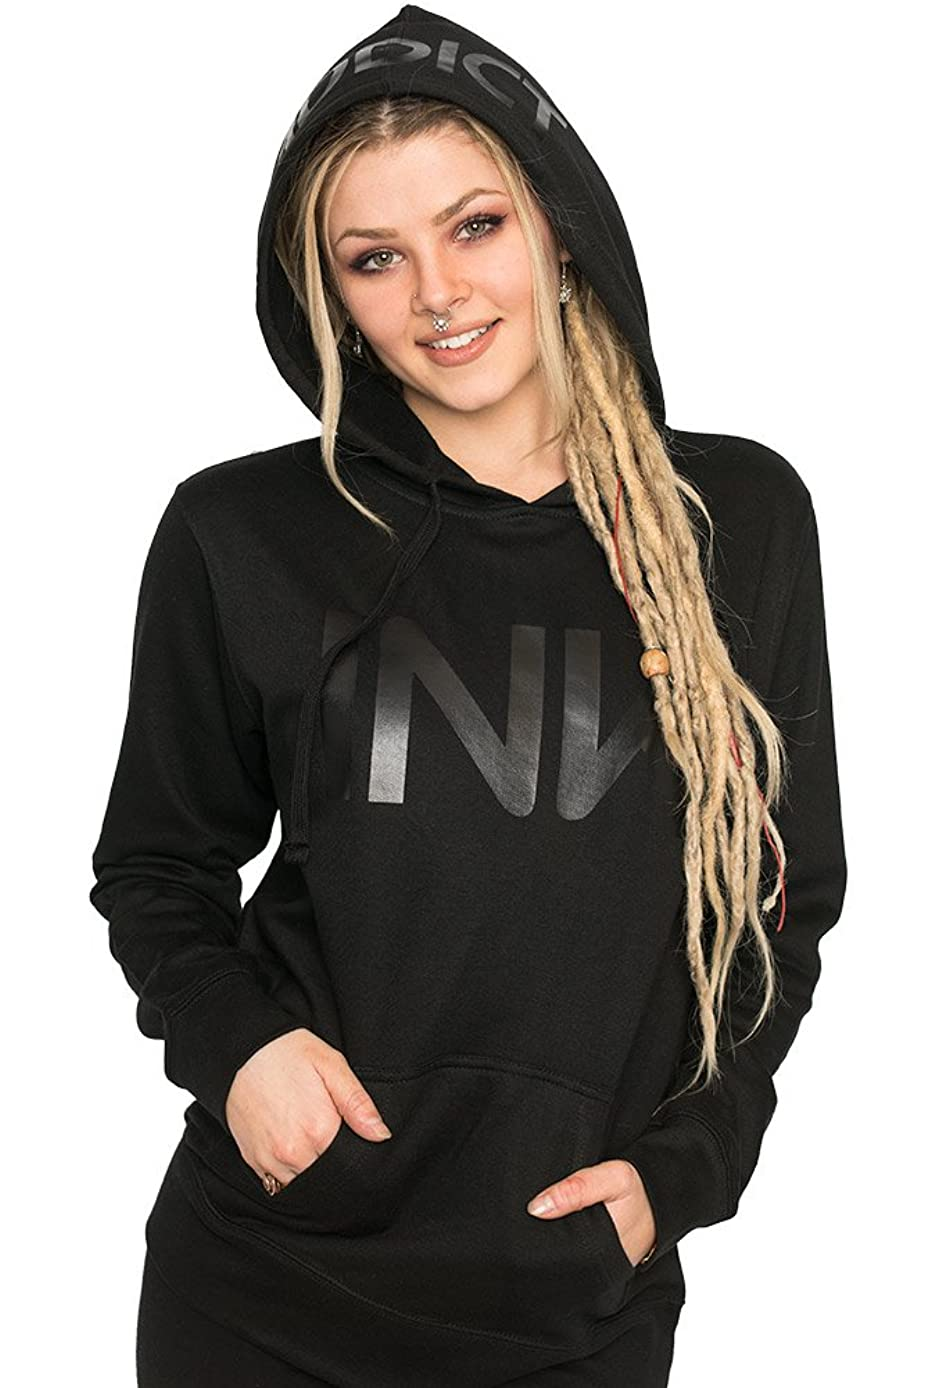 Ink Addict InkAddict Women's Black Pullover Hoodie - Tattoo Inspired Logo Lightweight Pullover for Women